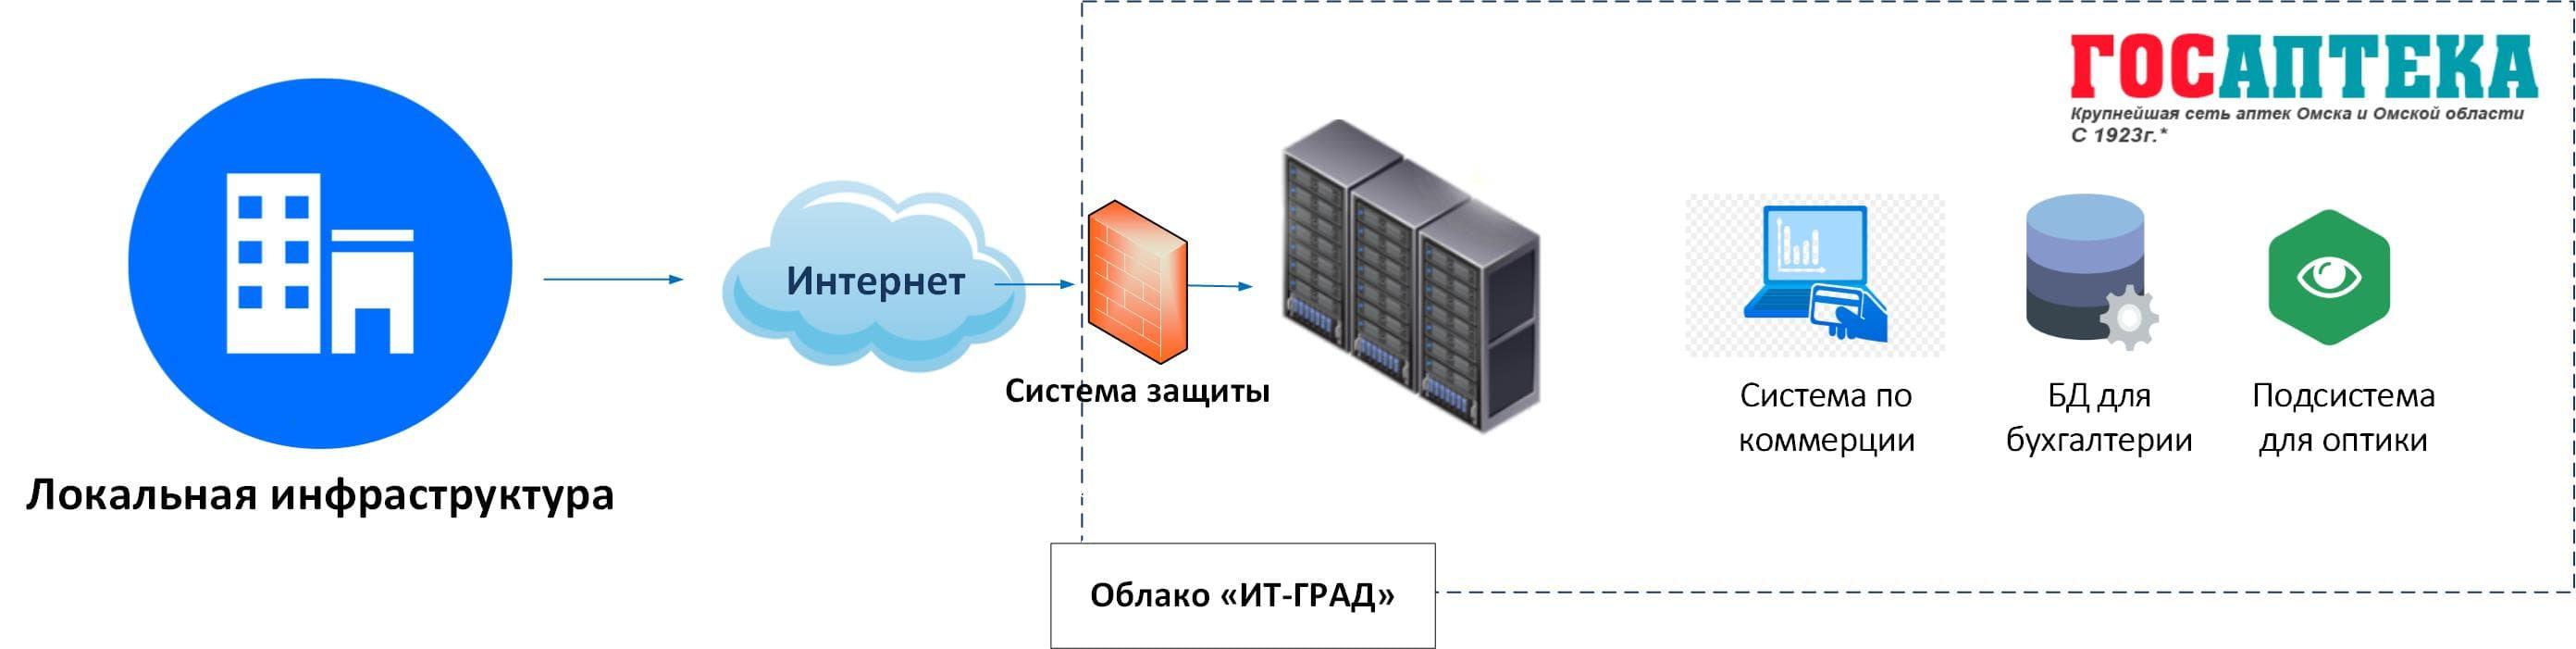 Фрагмент облачной инфраструктуры «ГОСАПТЕКА»